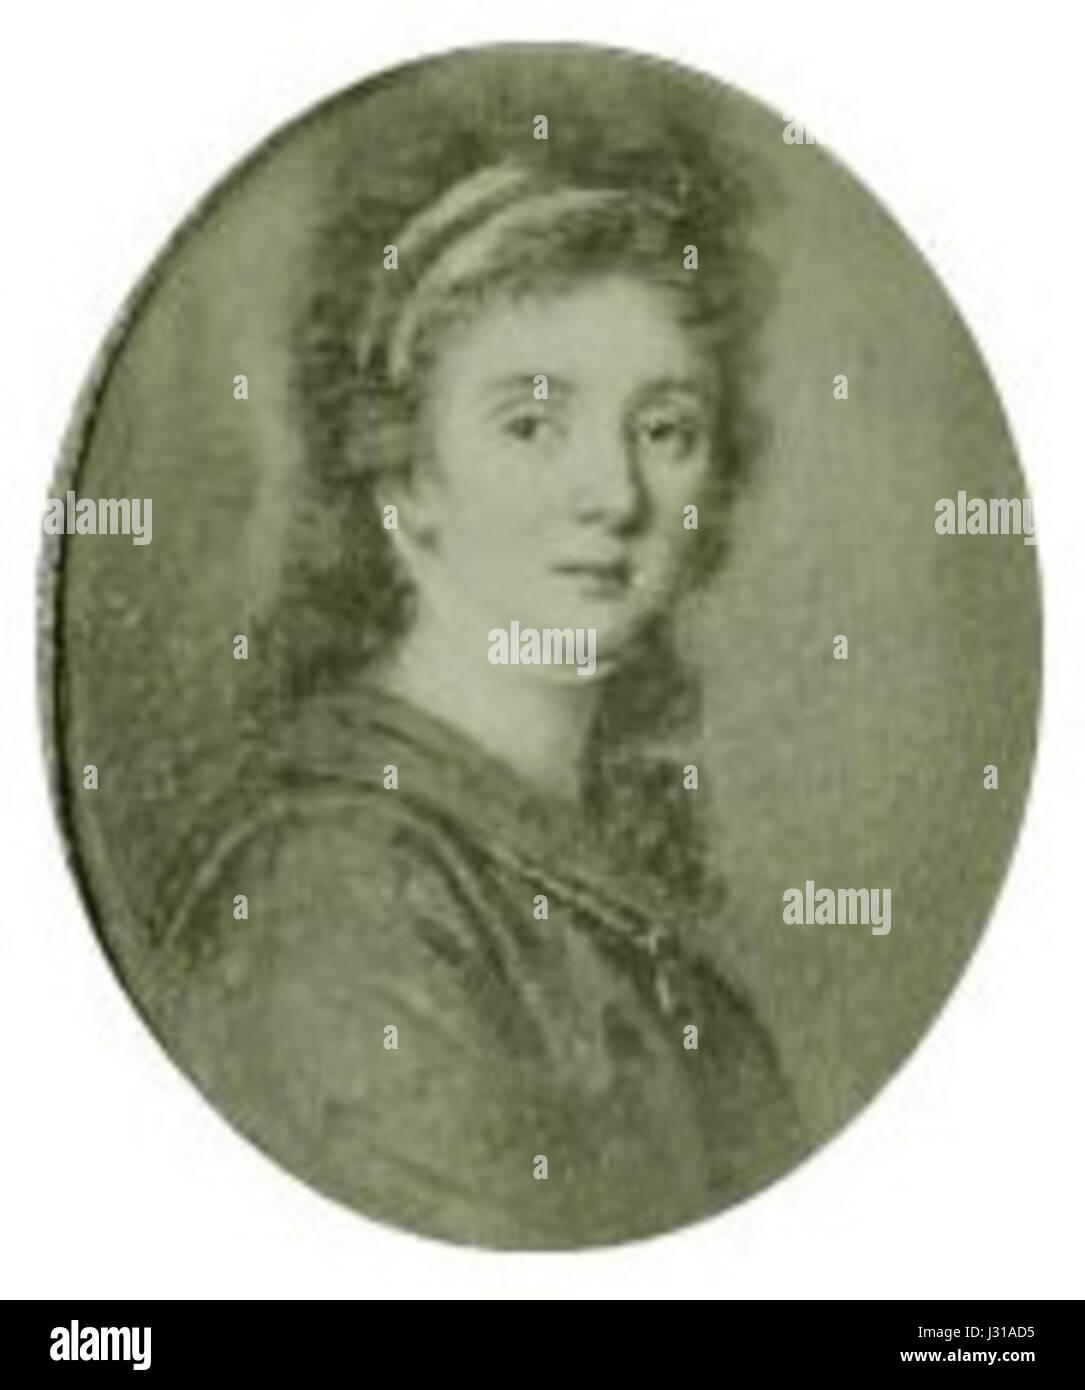 Benedikte Sievers - Stock Image